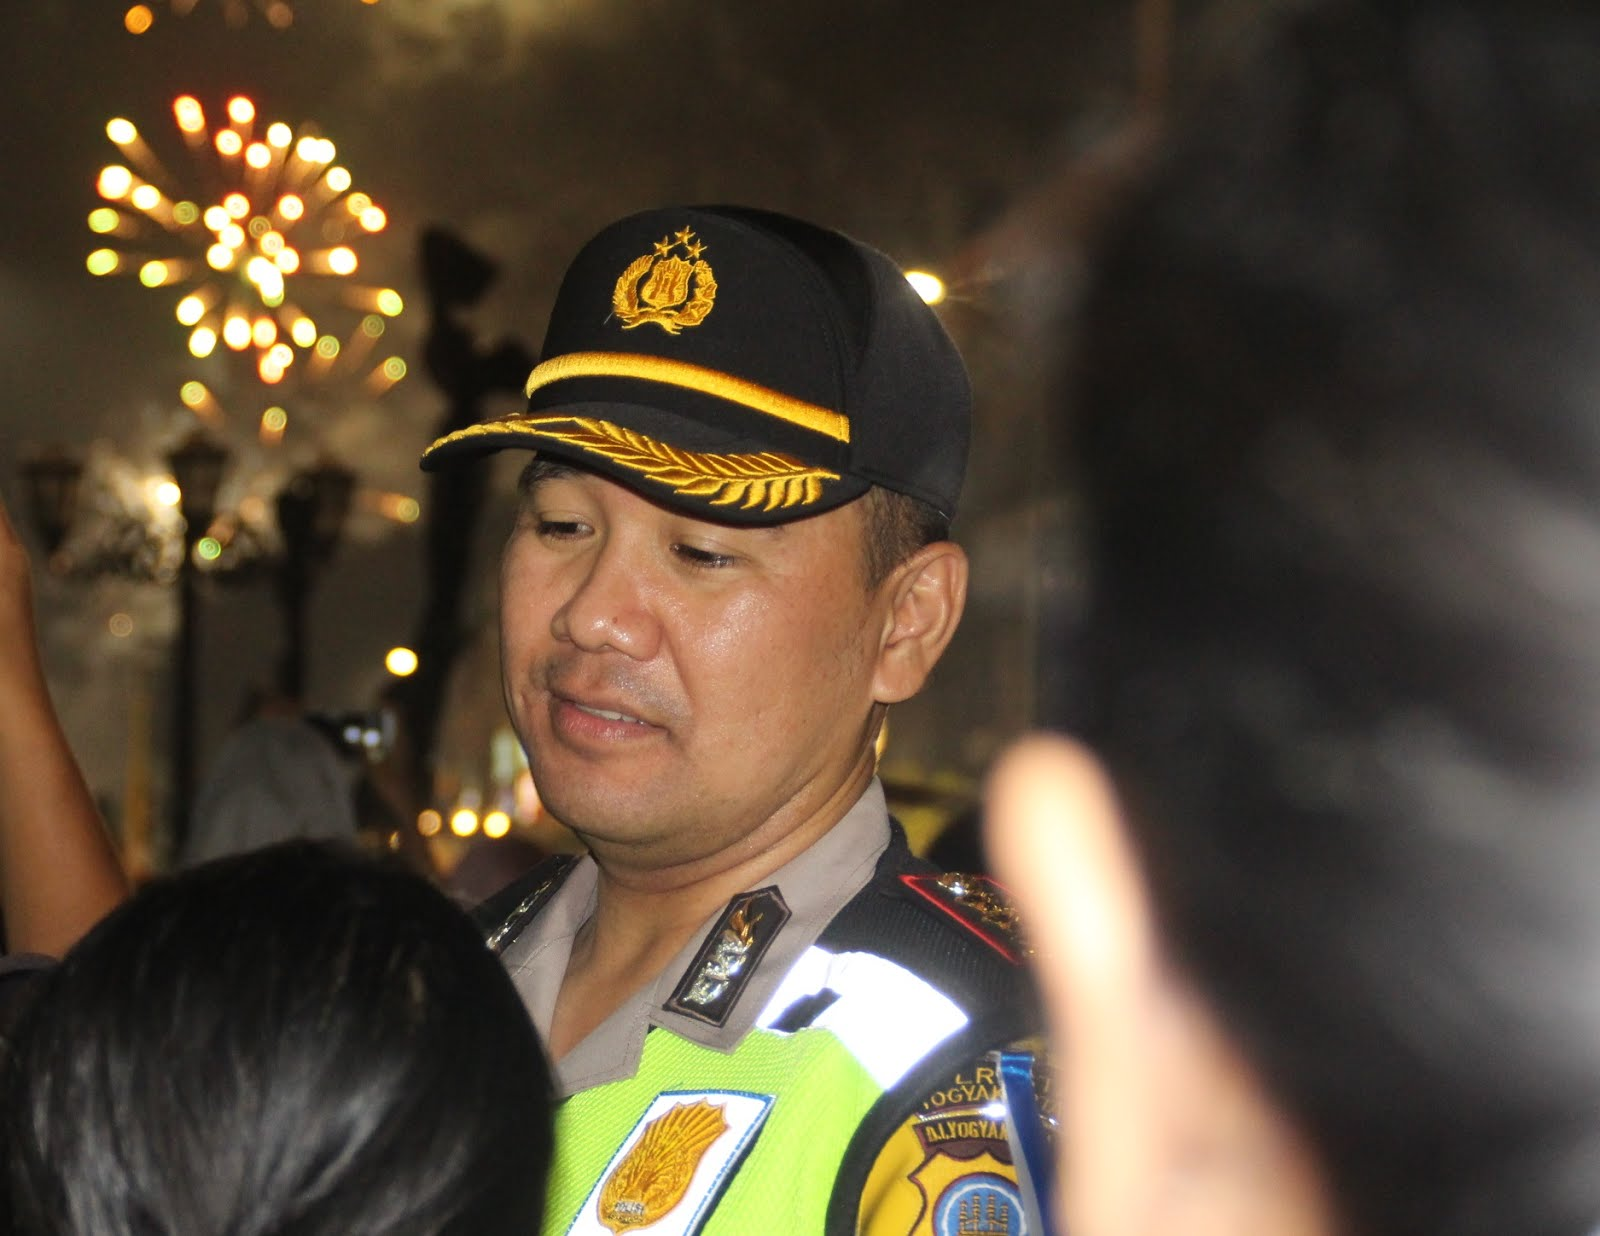 Kapolresta Yogyakarta$quote=Komisari Besar Polisi Tommy Wibisono, S.Ik